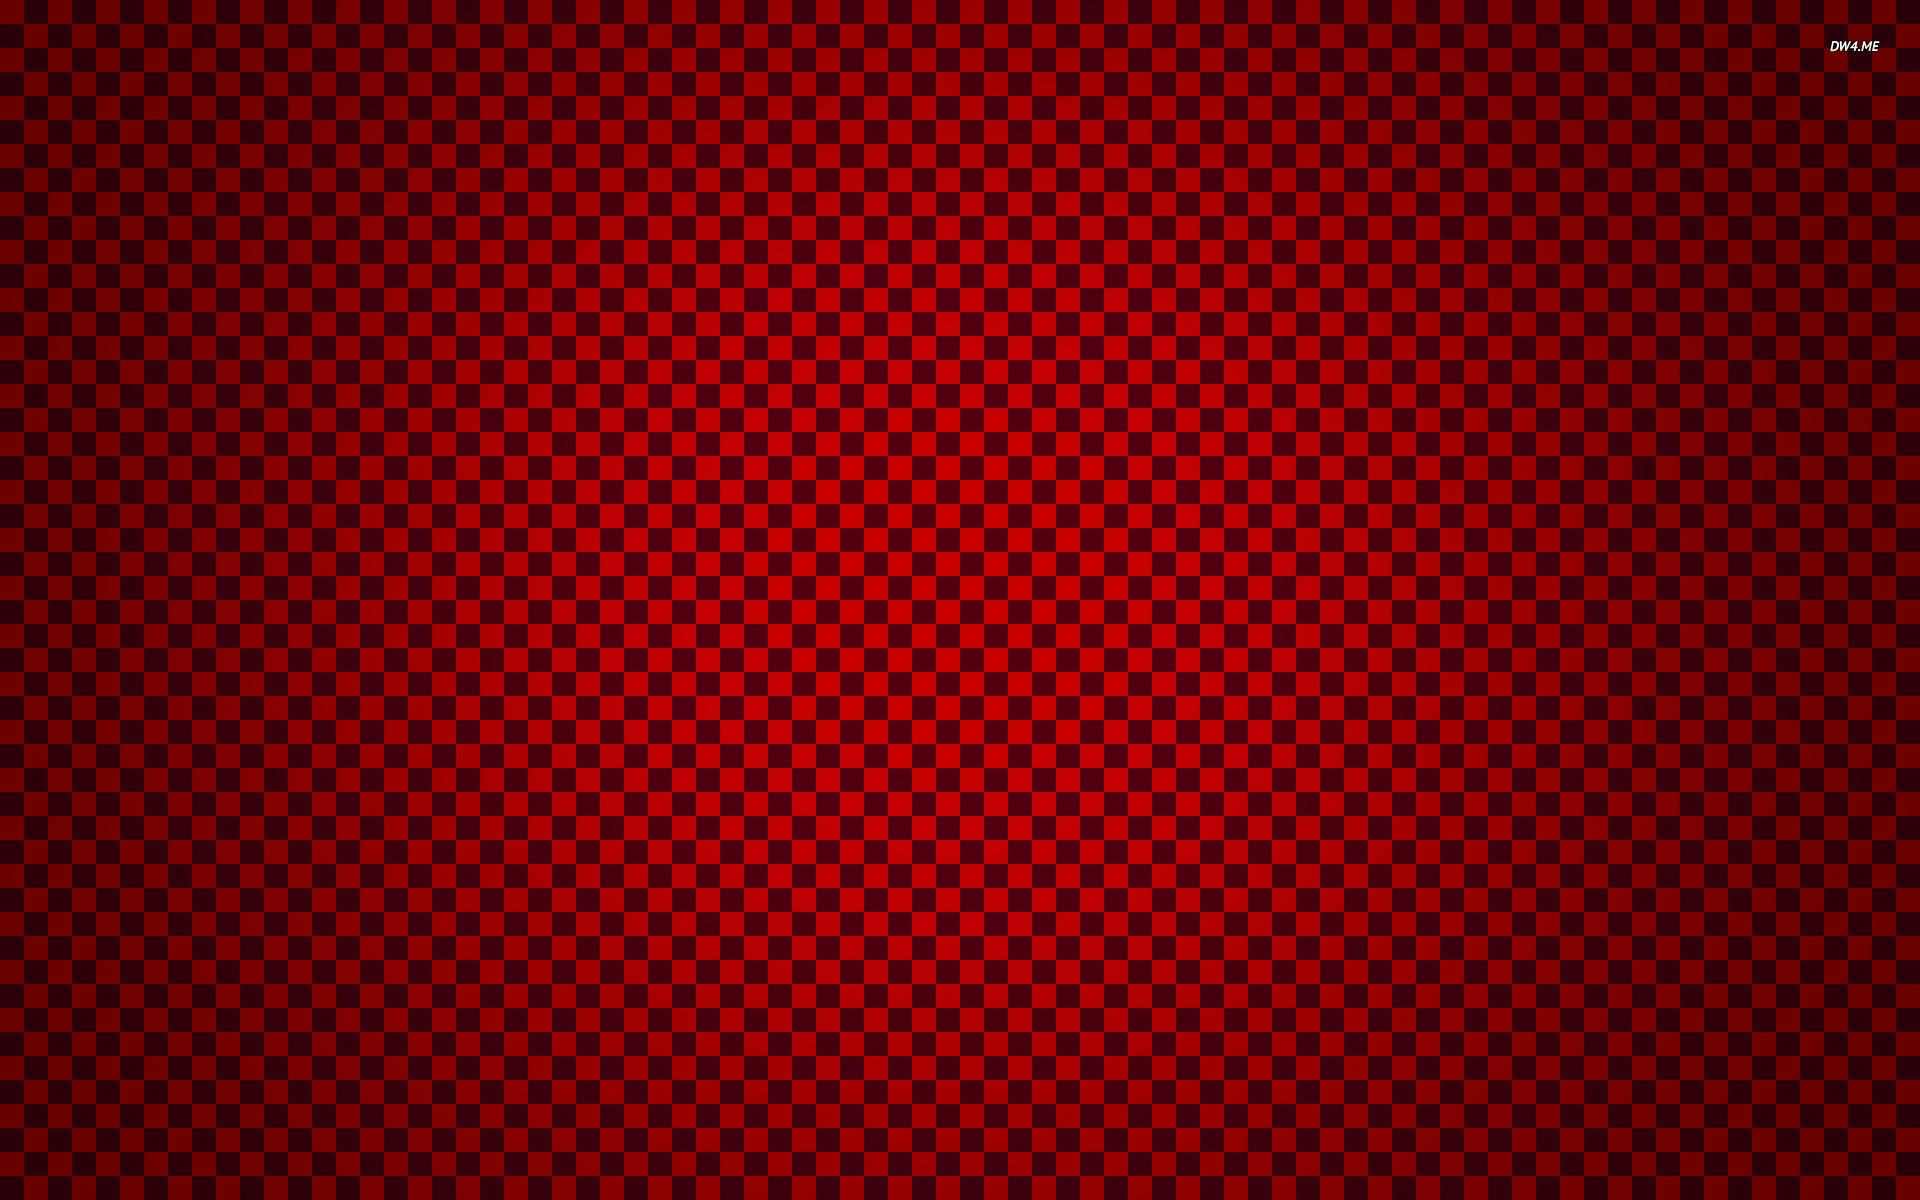 Red checkered pattern wallpaper   Digital Art wallpapers   1283 1920x1200